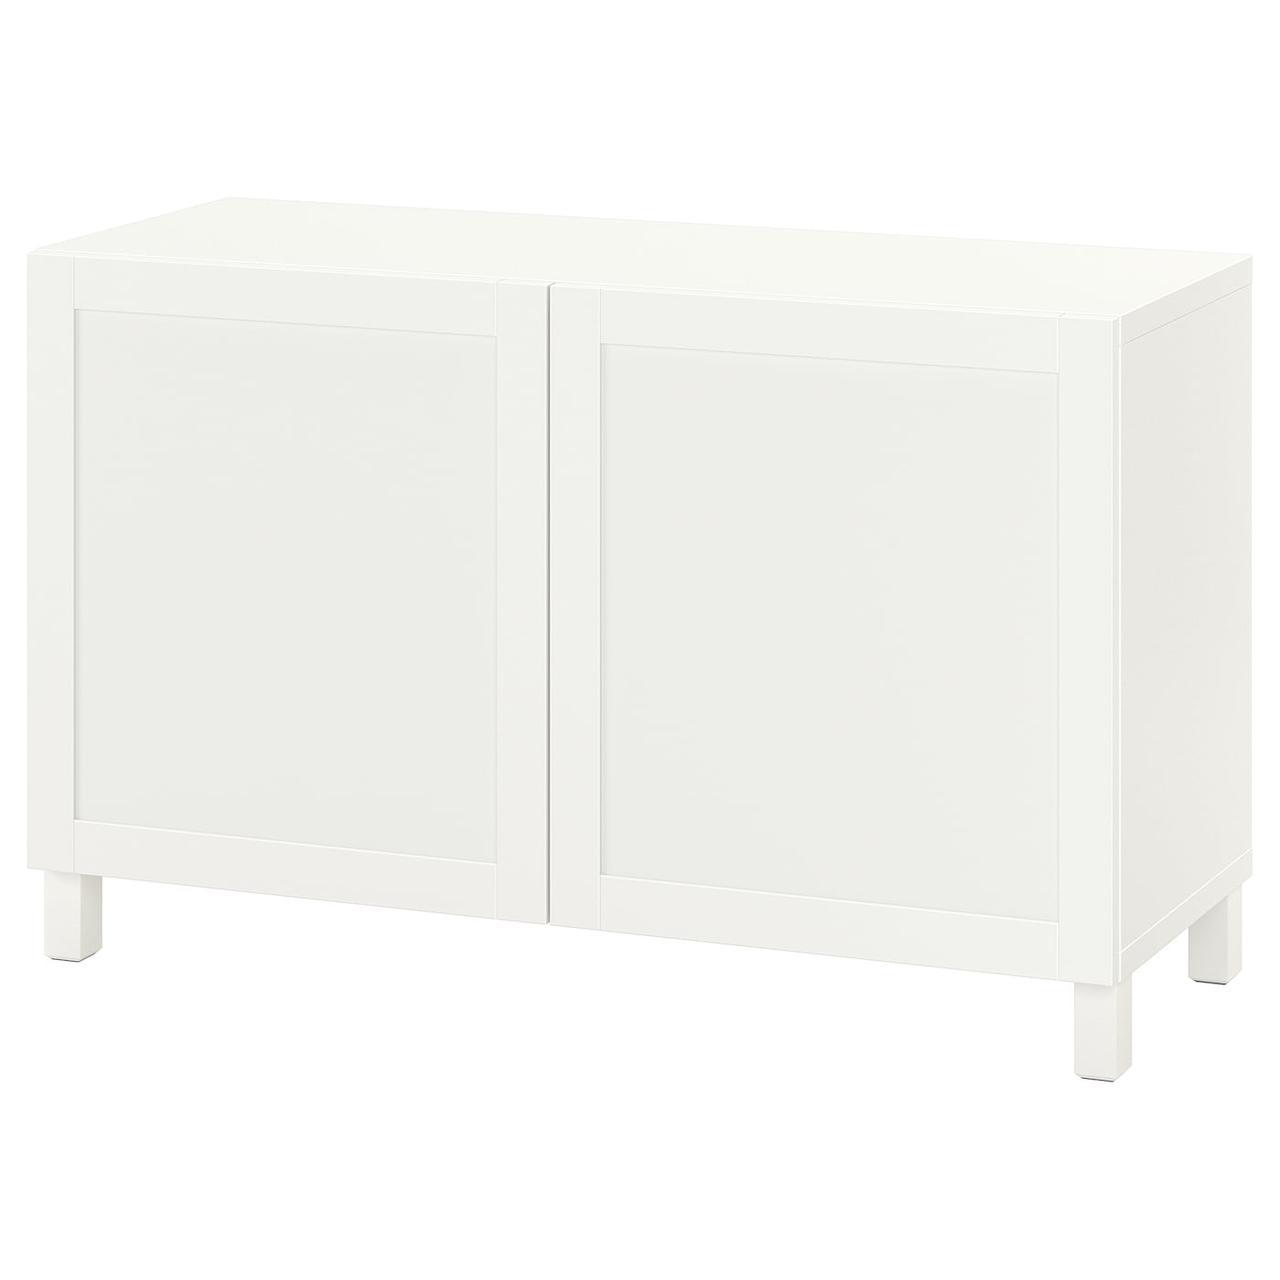 IKEA BESTÅ Комбинация с дверцами белый/Hanviken/Stubbarp белый 120x42x74 см